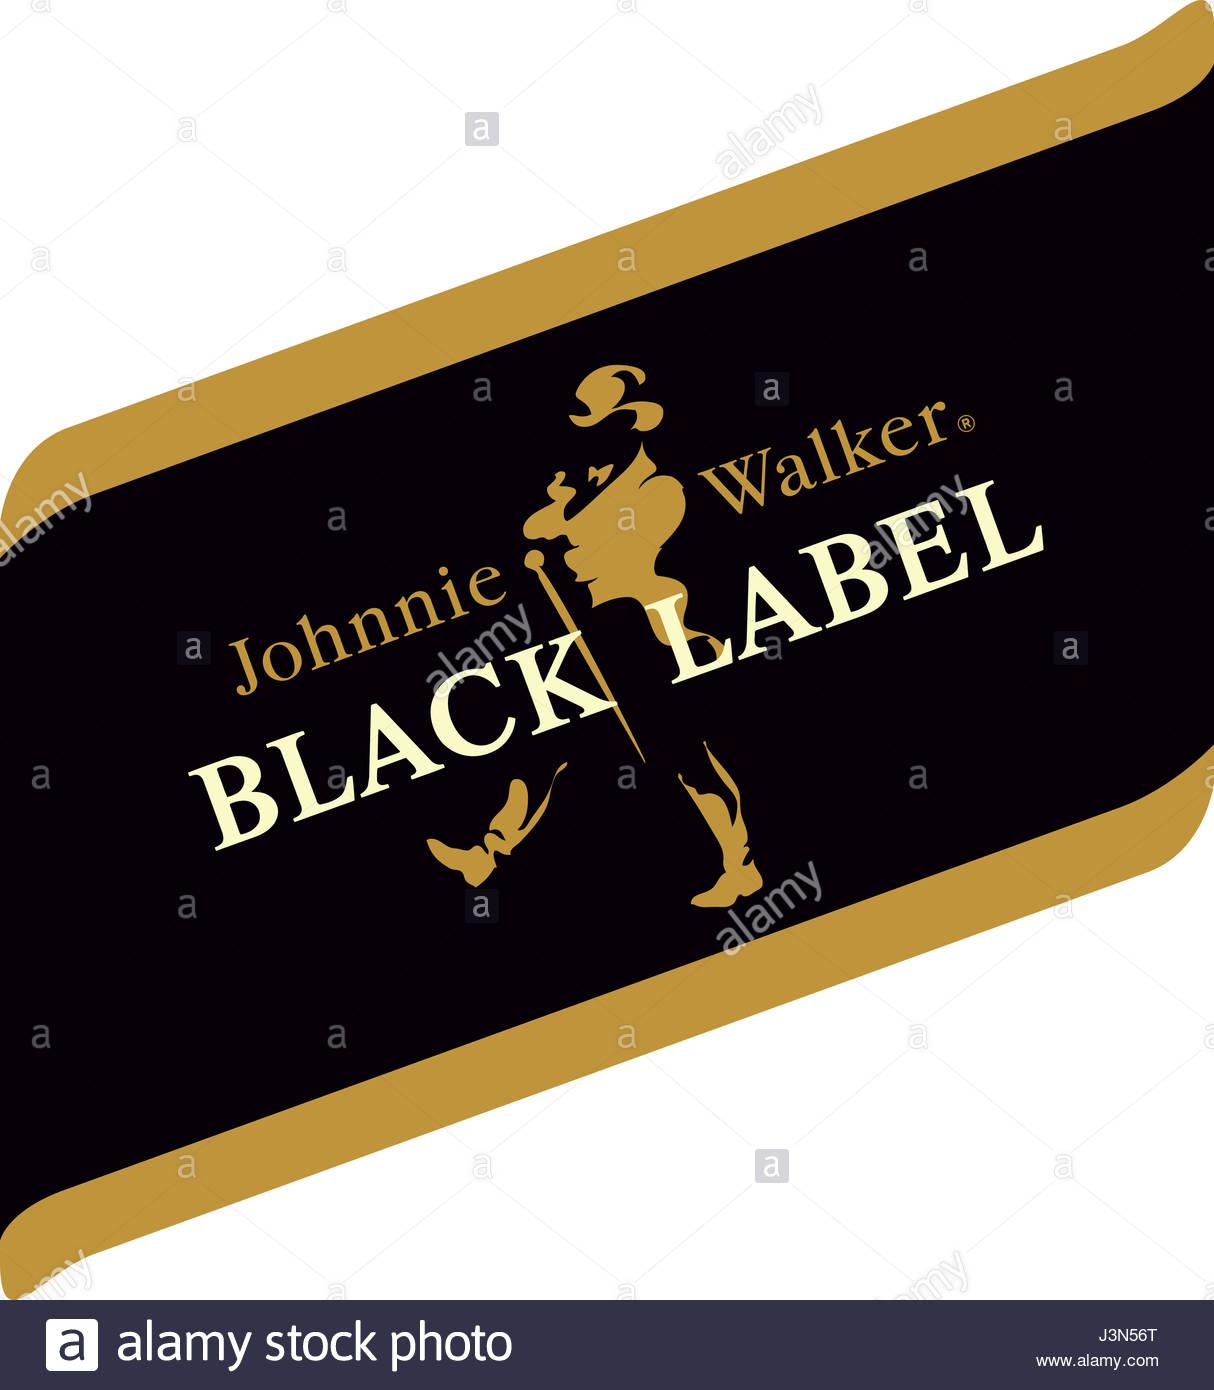 Black Label Johnnie Walker Whiskey Stock Photo 139992016 Alamy